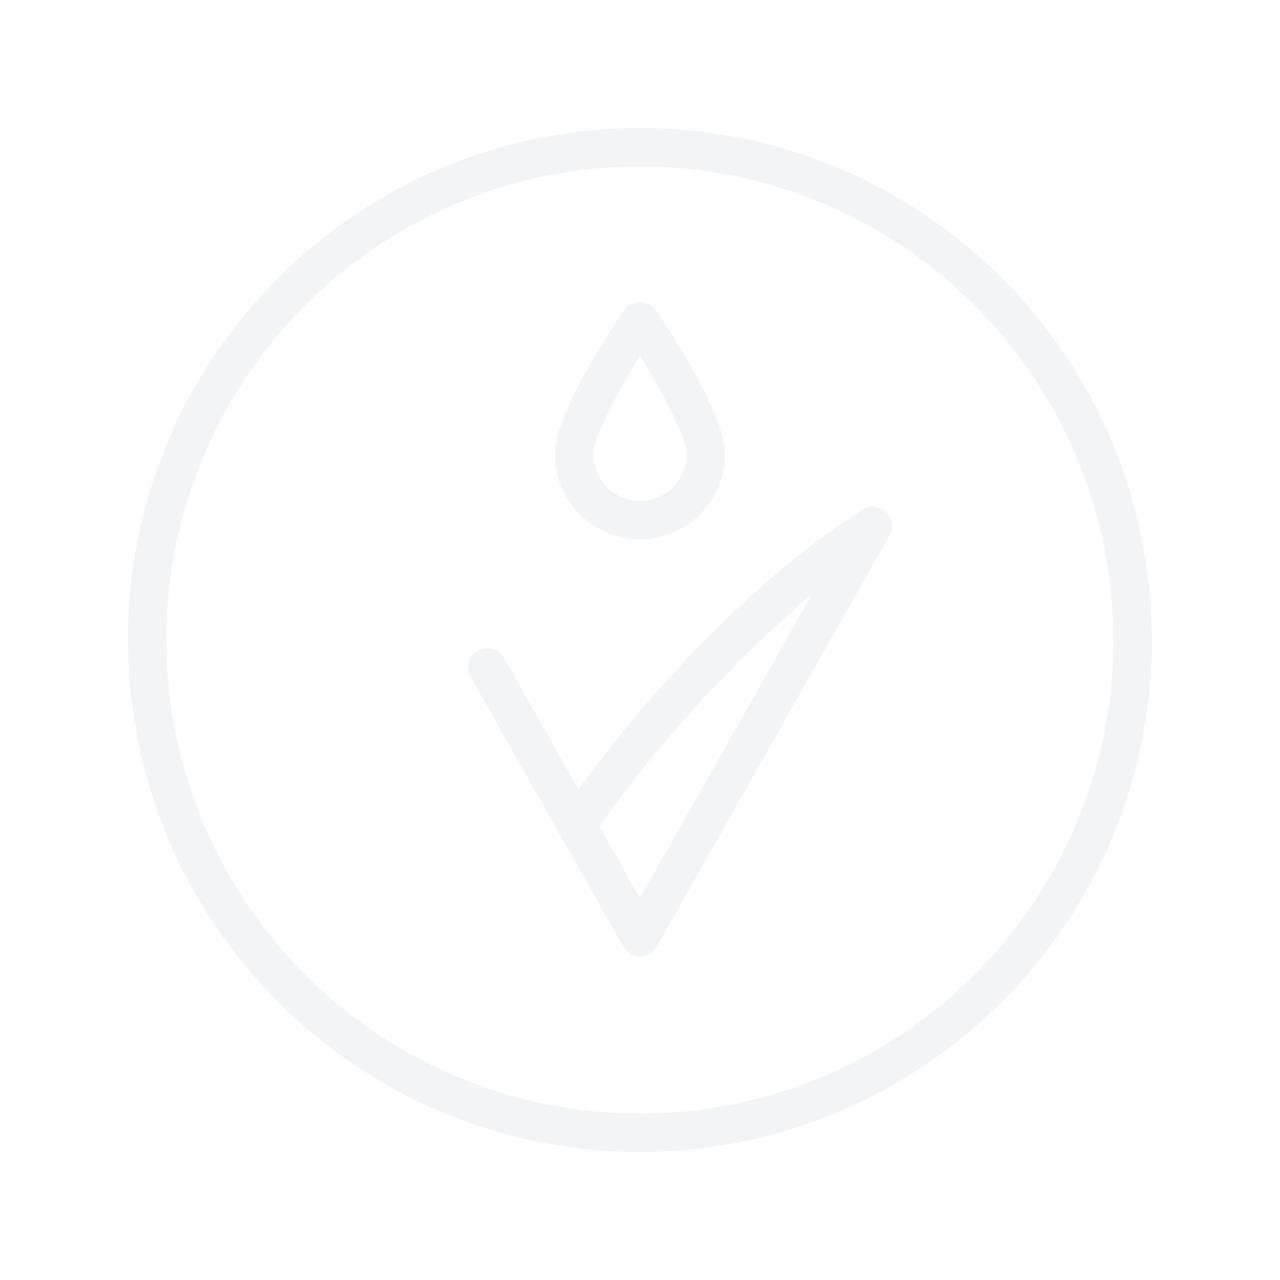 JOIK ORGANIC Sidruni ja geraaniumi minaraaldeodorant 50ml